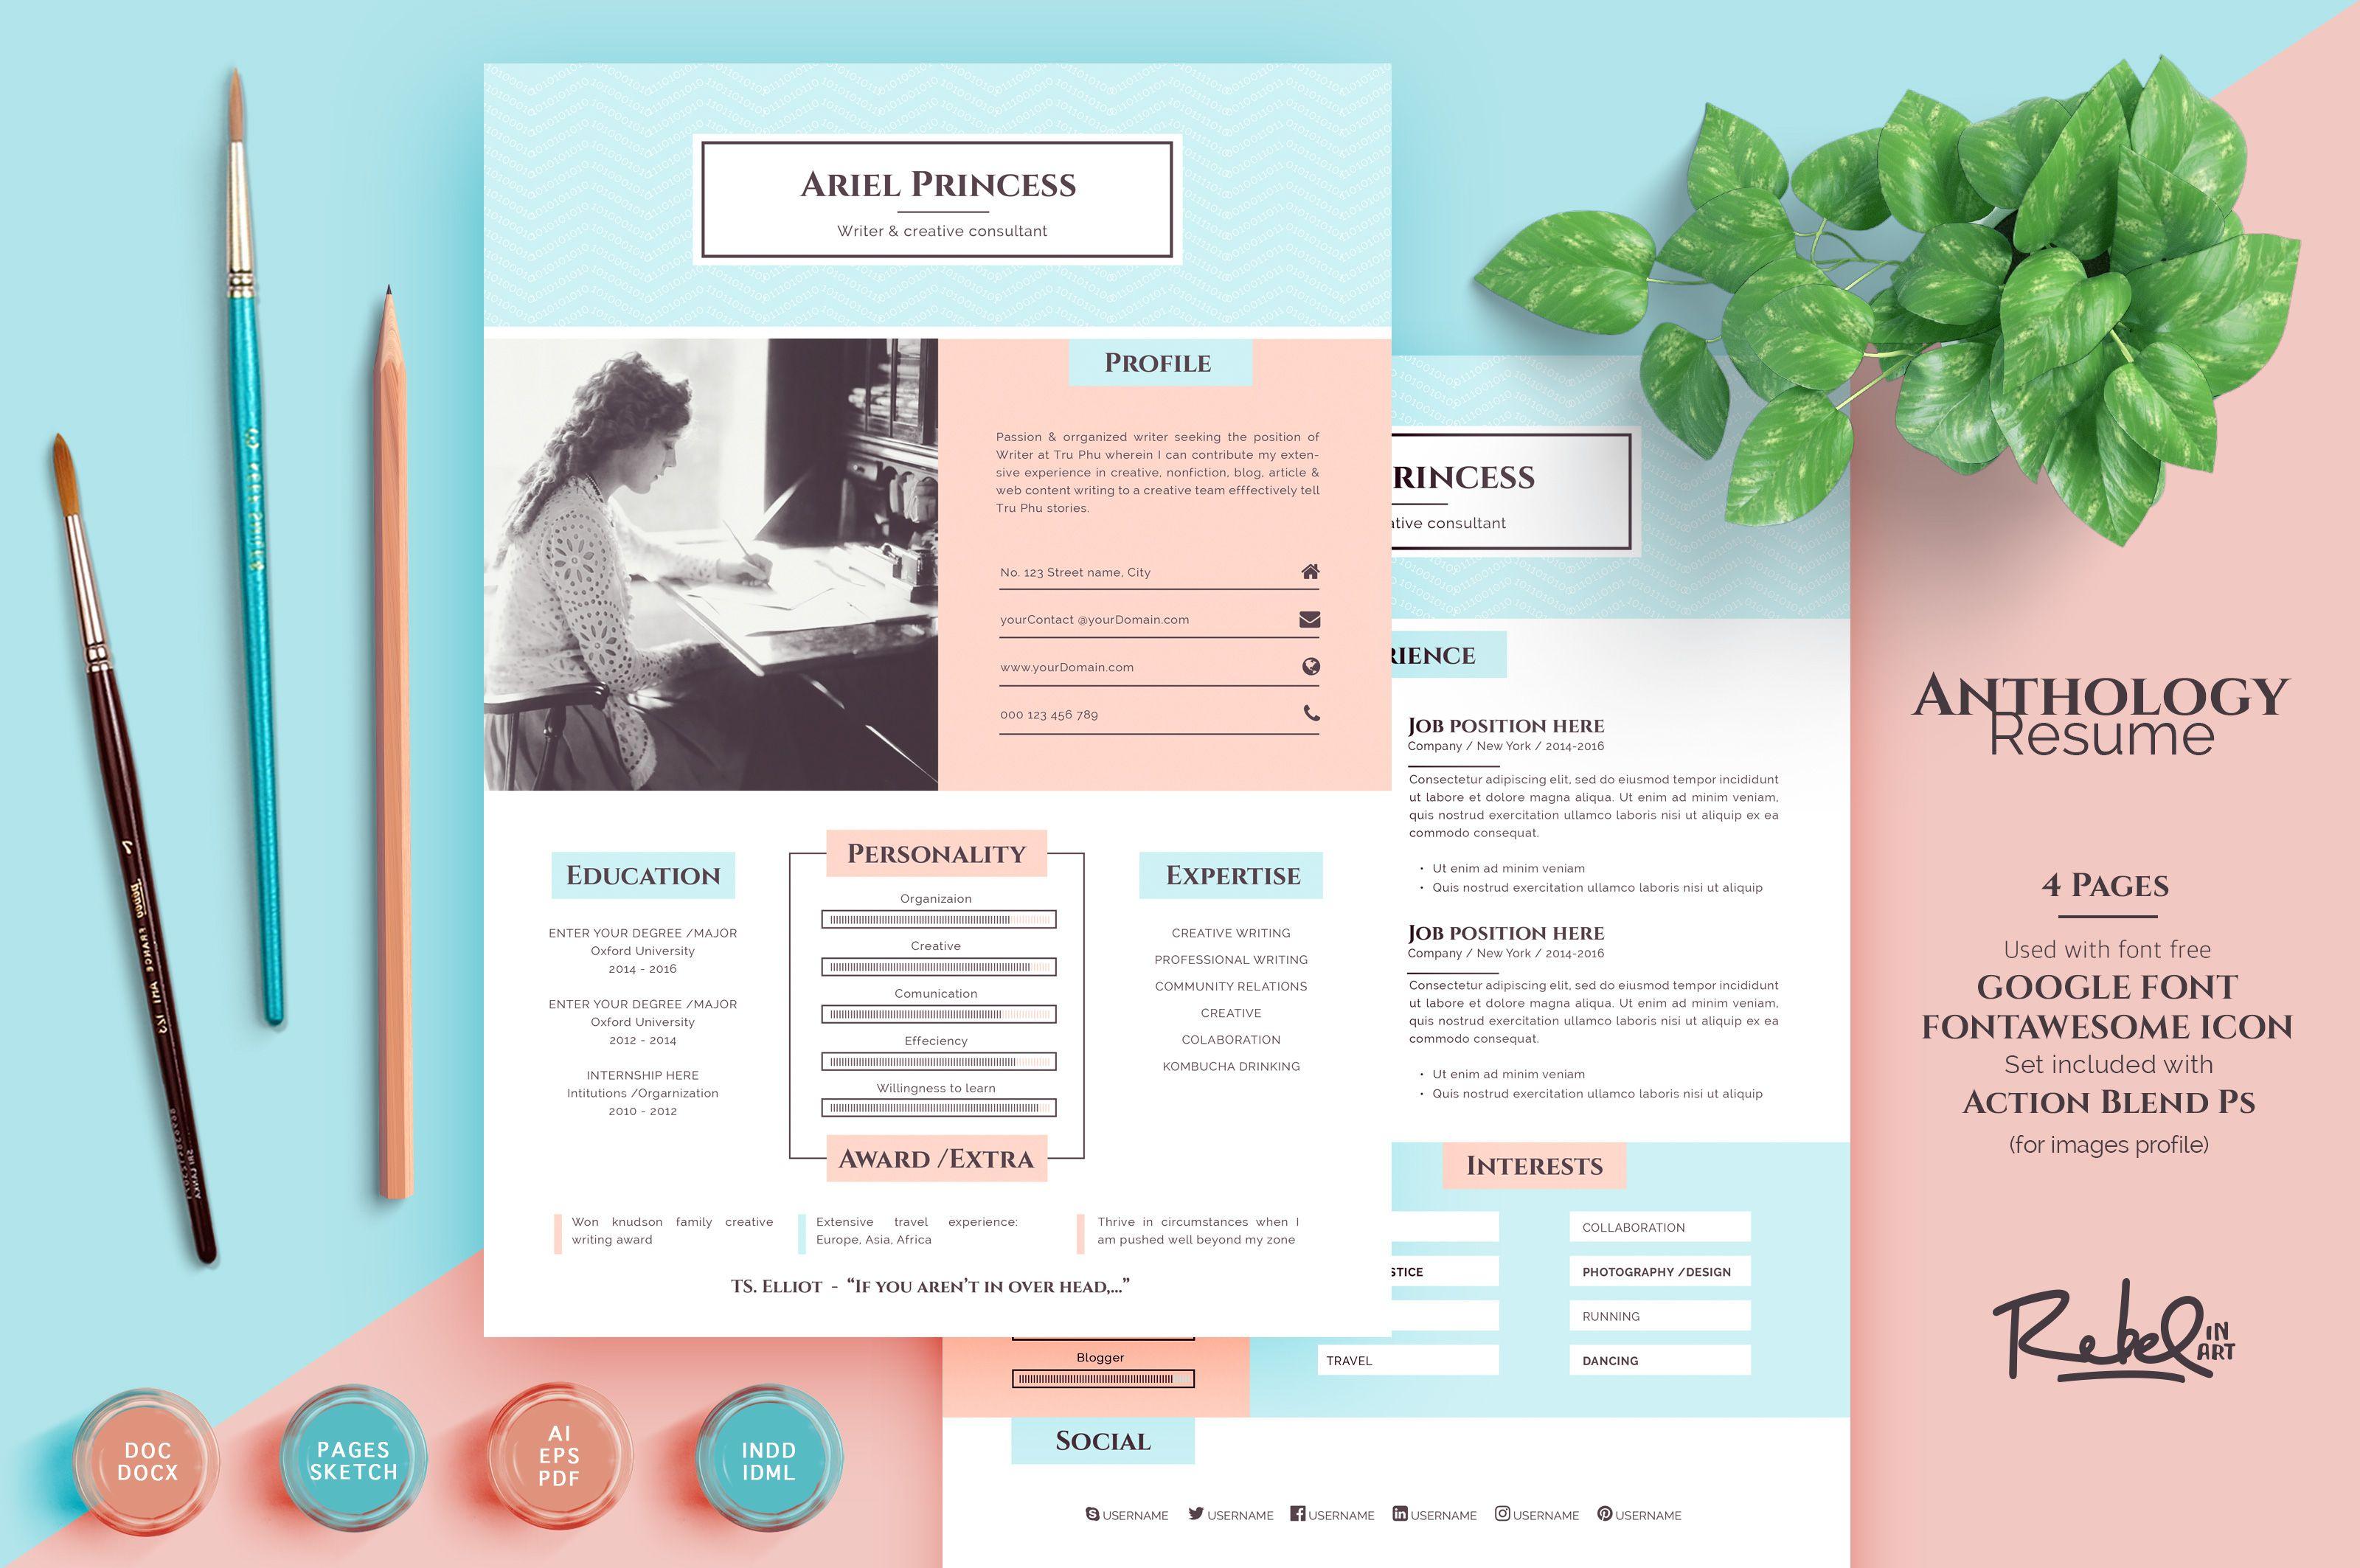 Anthology resume cv 4 page support multiformat on